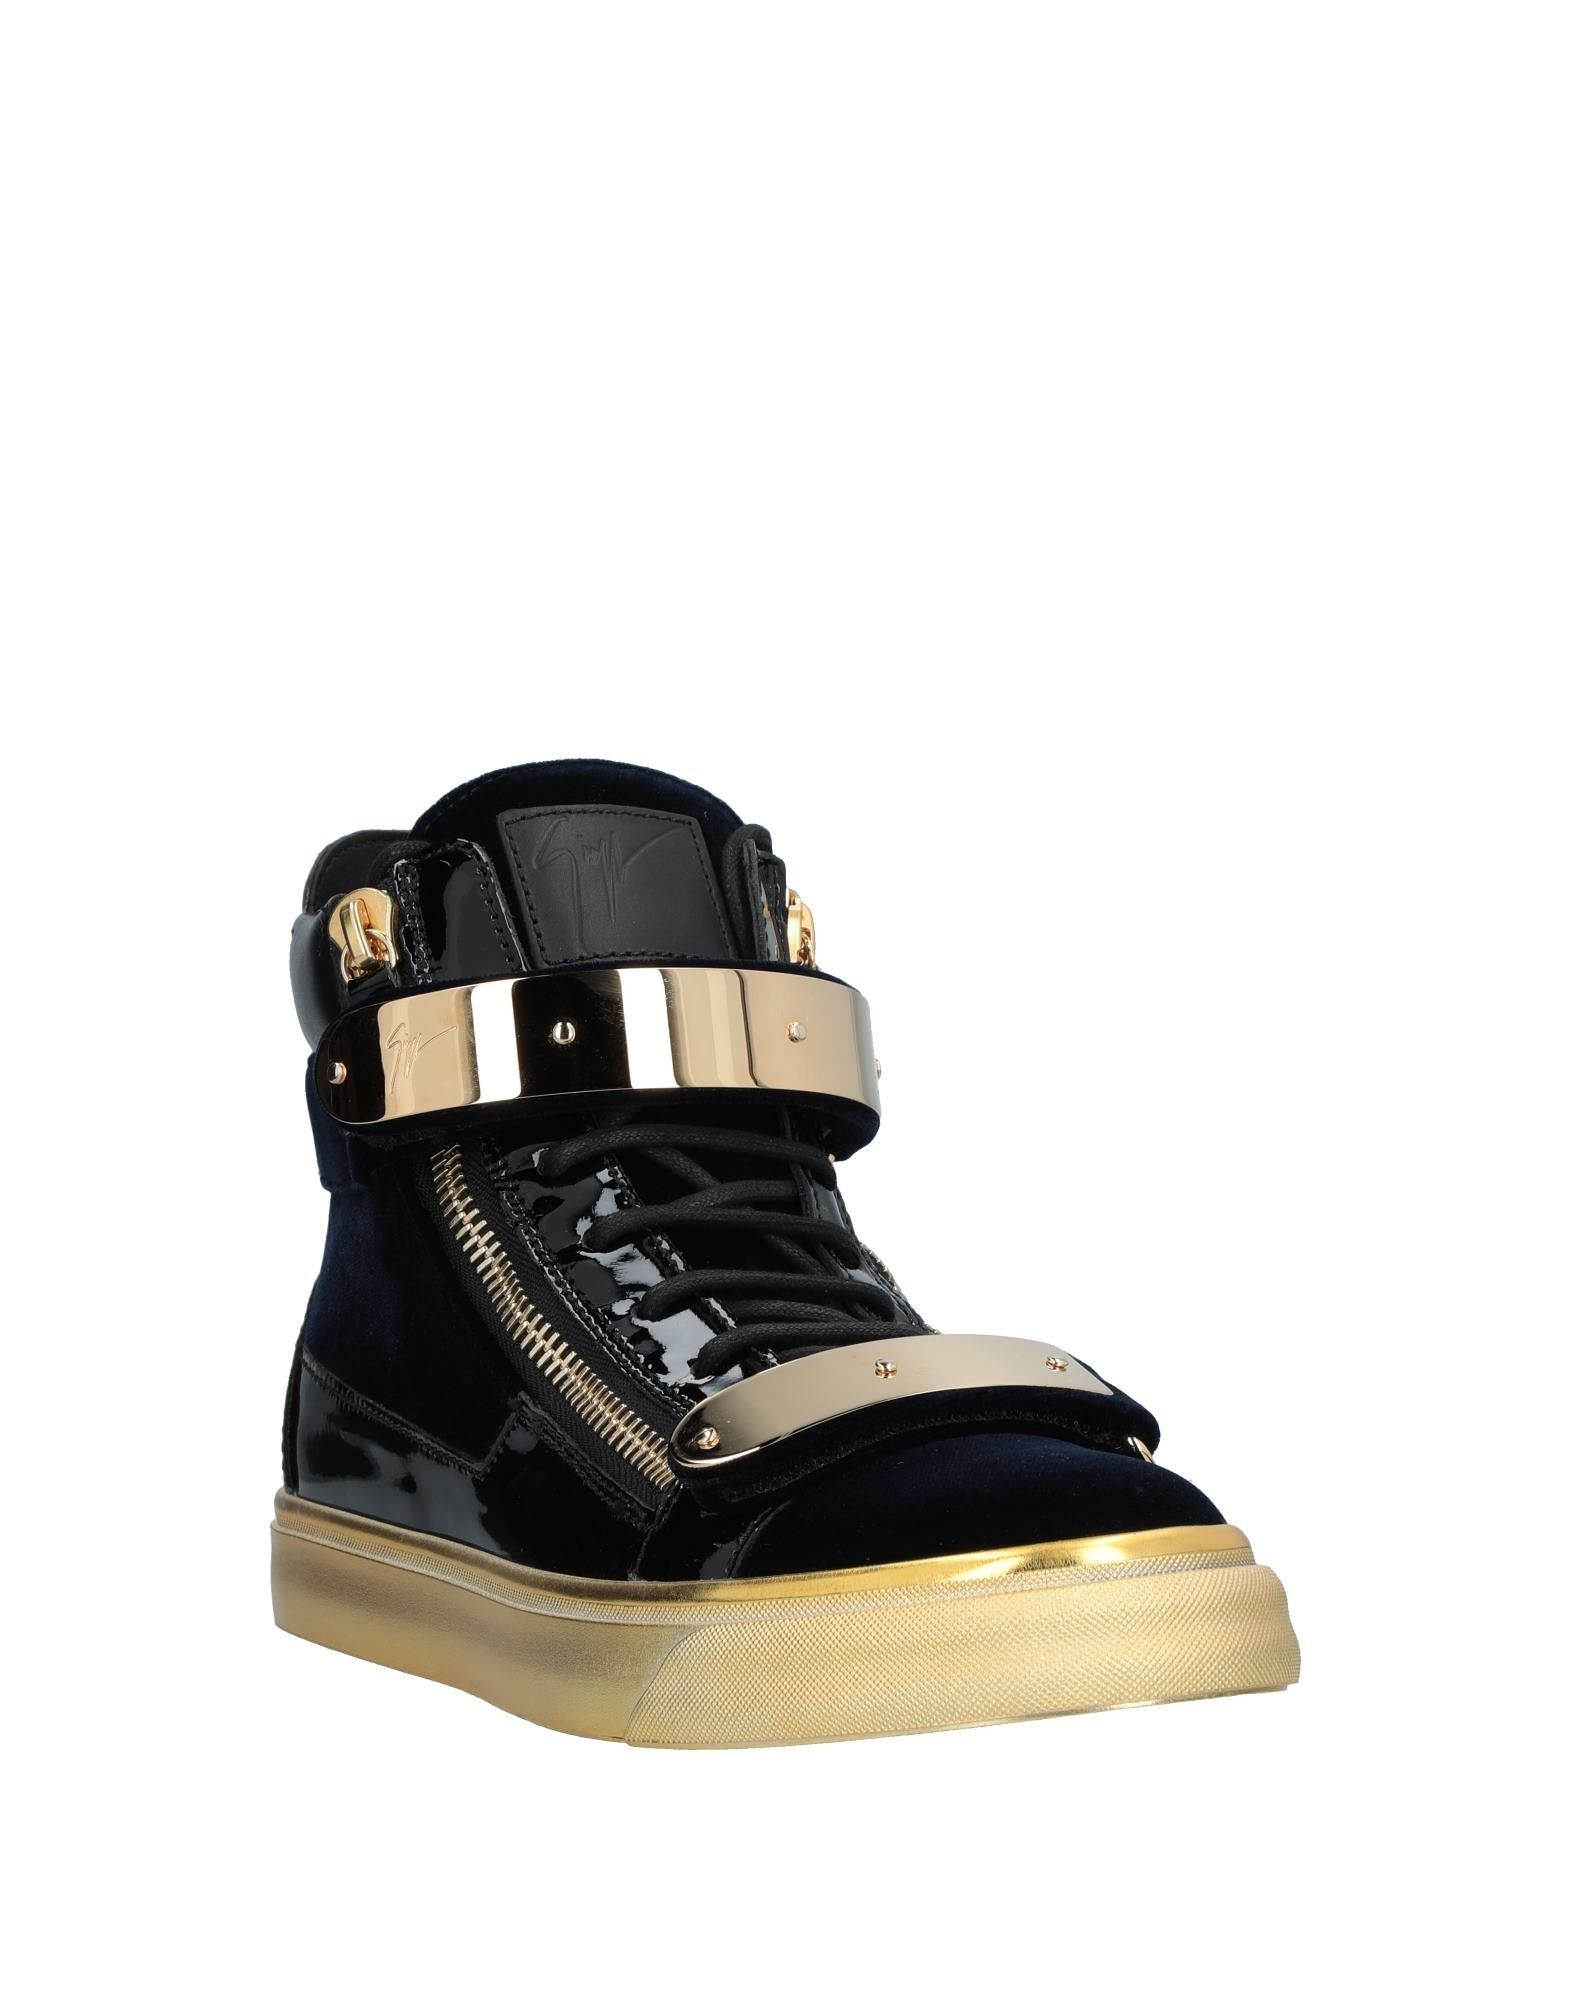 Giuseppe Zanotti Sneakers Herren  Schuhe 11537011DV Gute Qualität beliebte Schuhe  551b0f